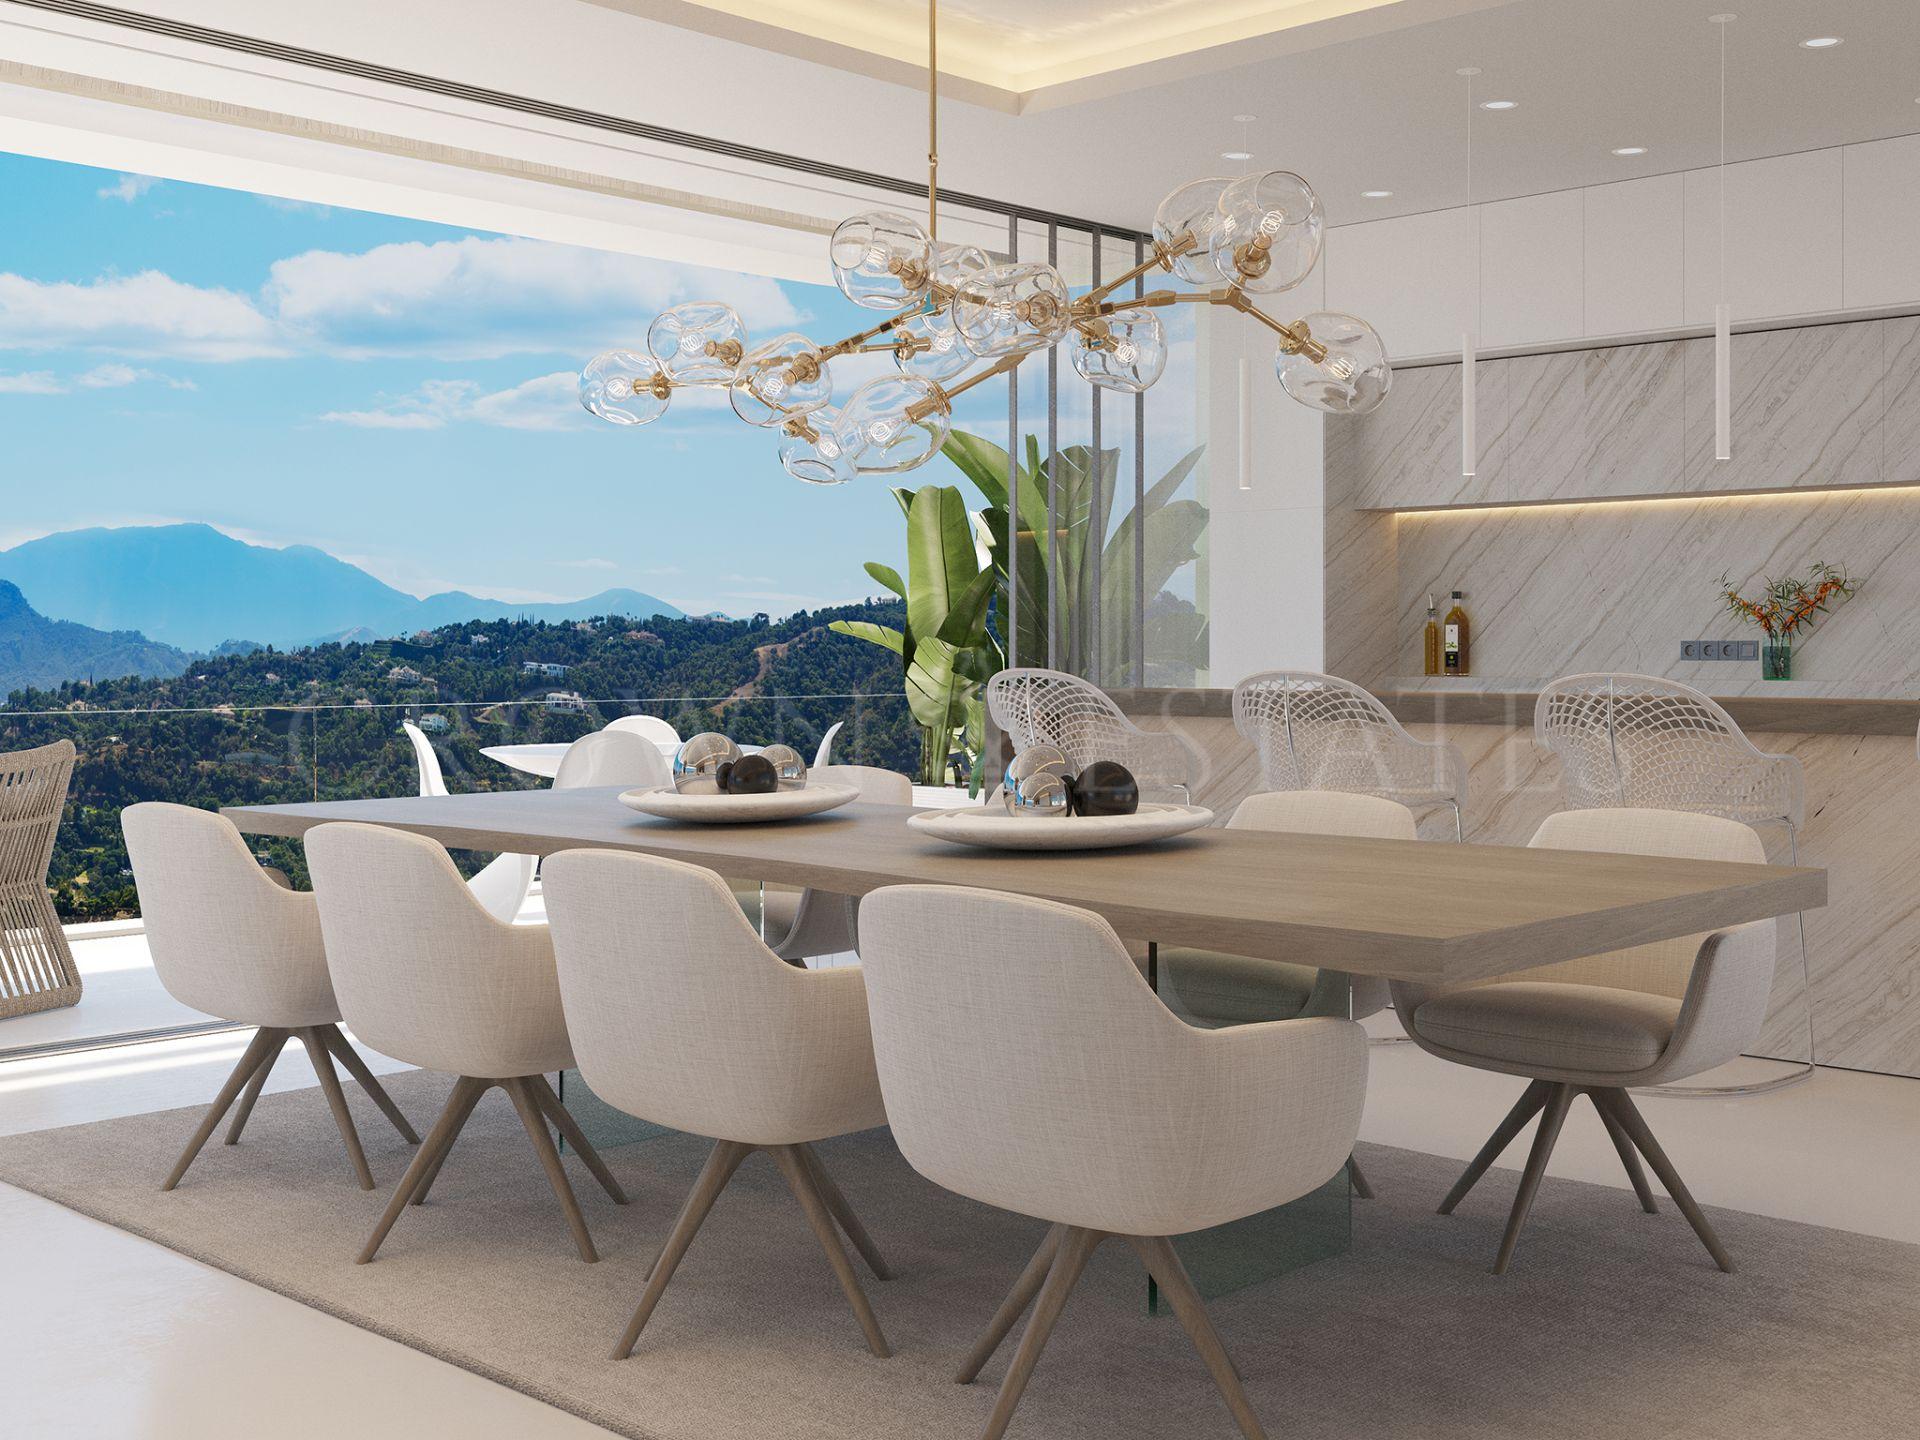 Vista Lago Residences - 18 Individually-Designed Sustainable Villas